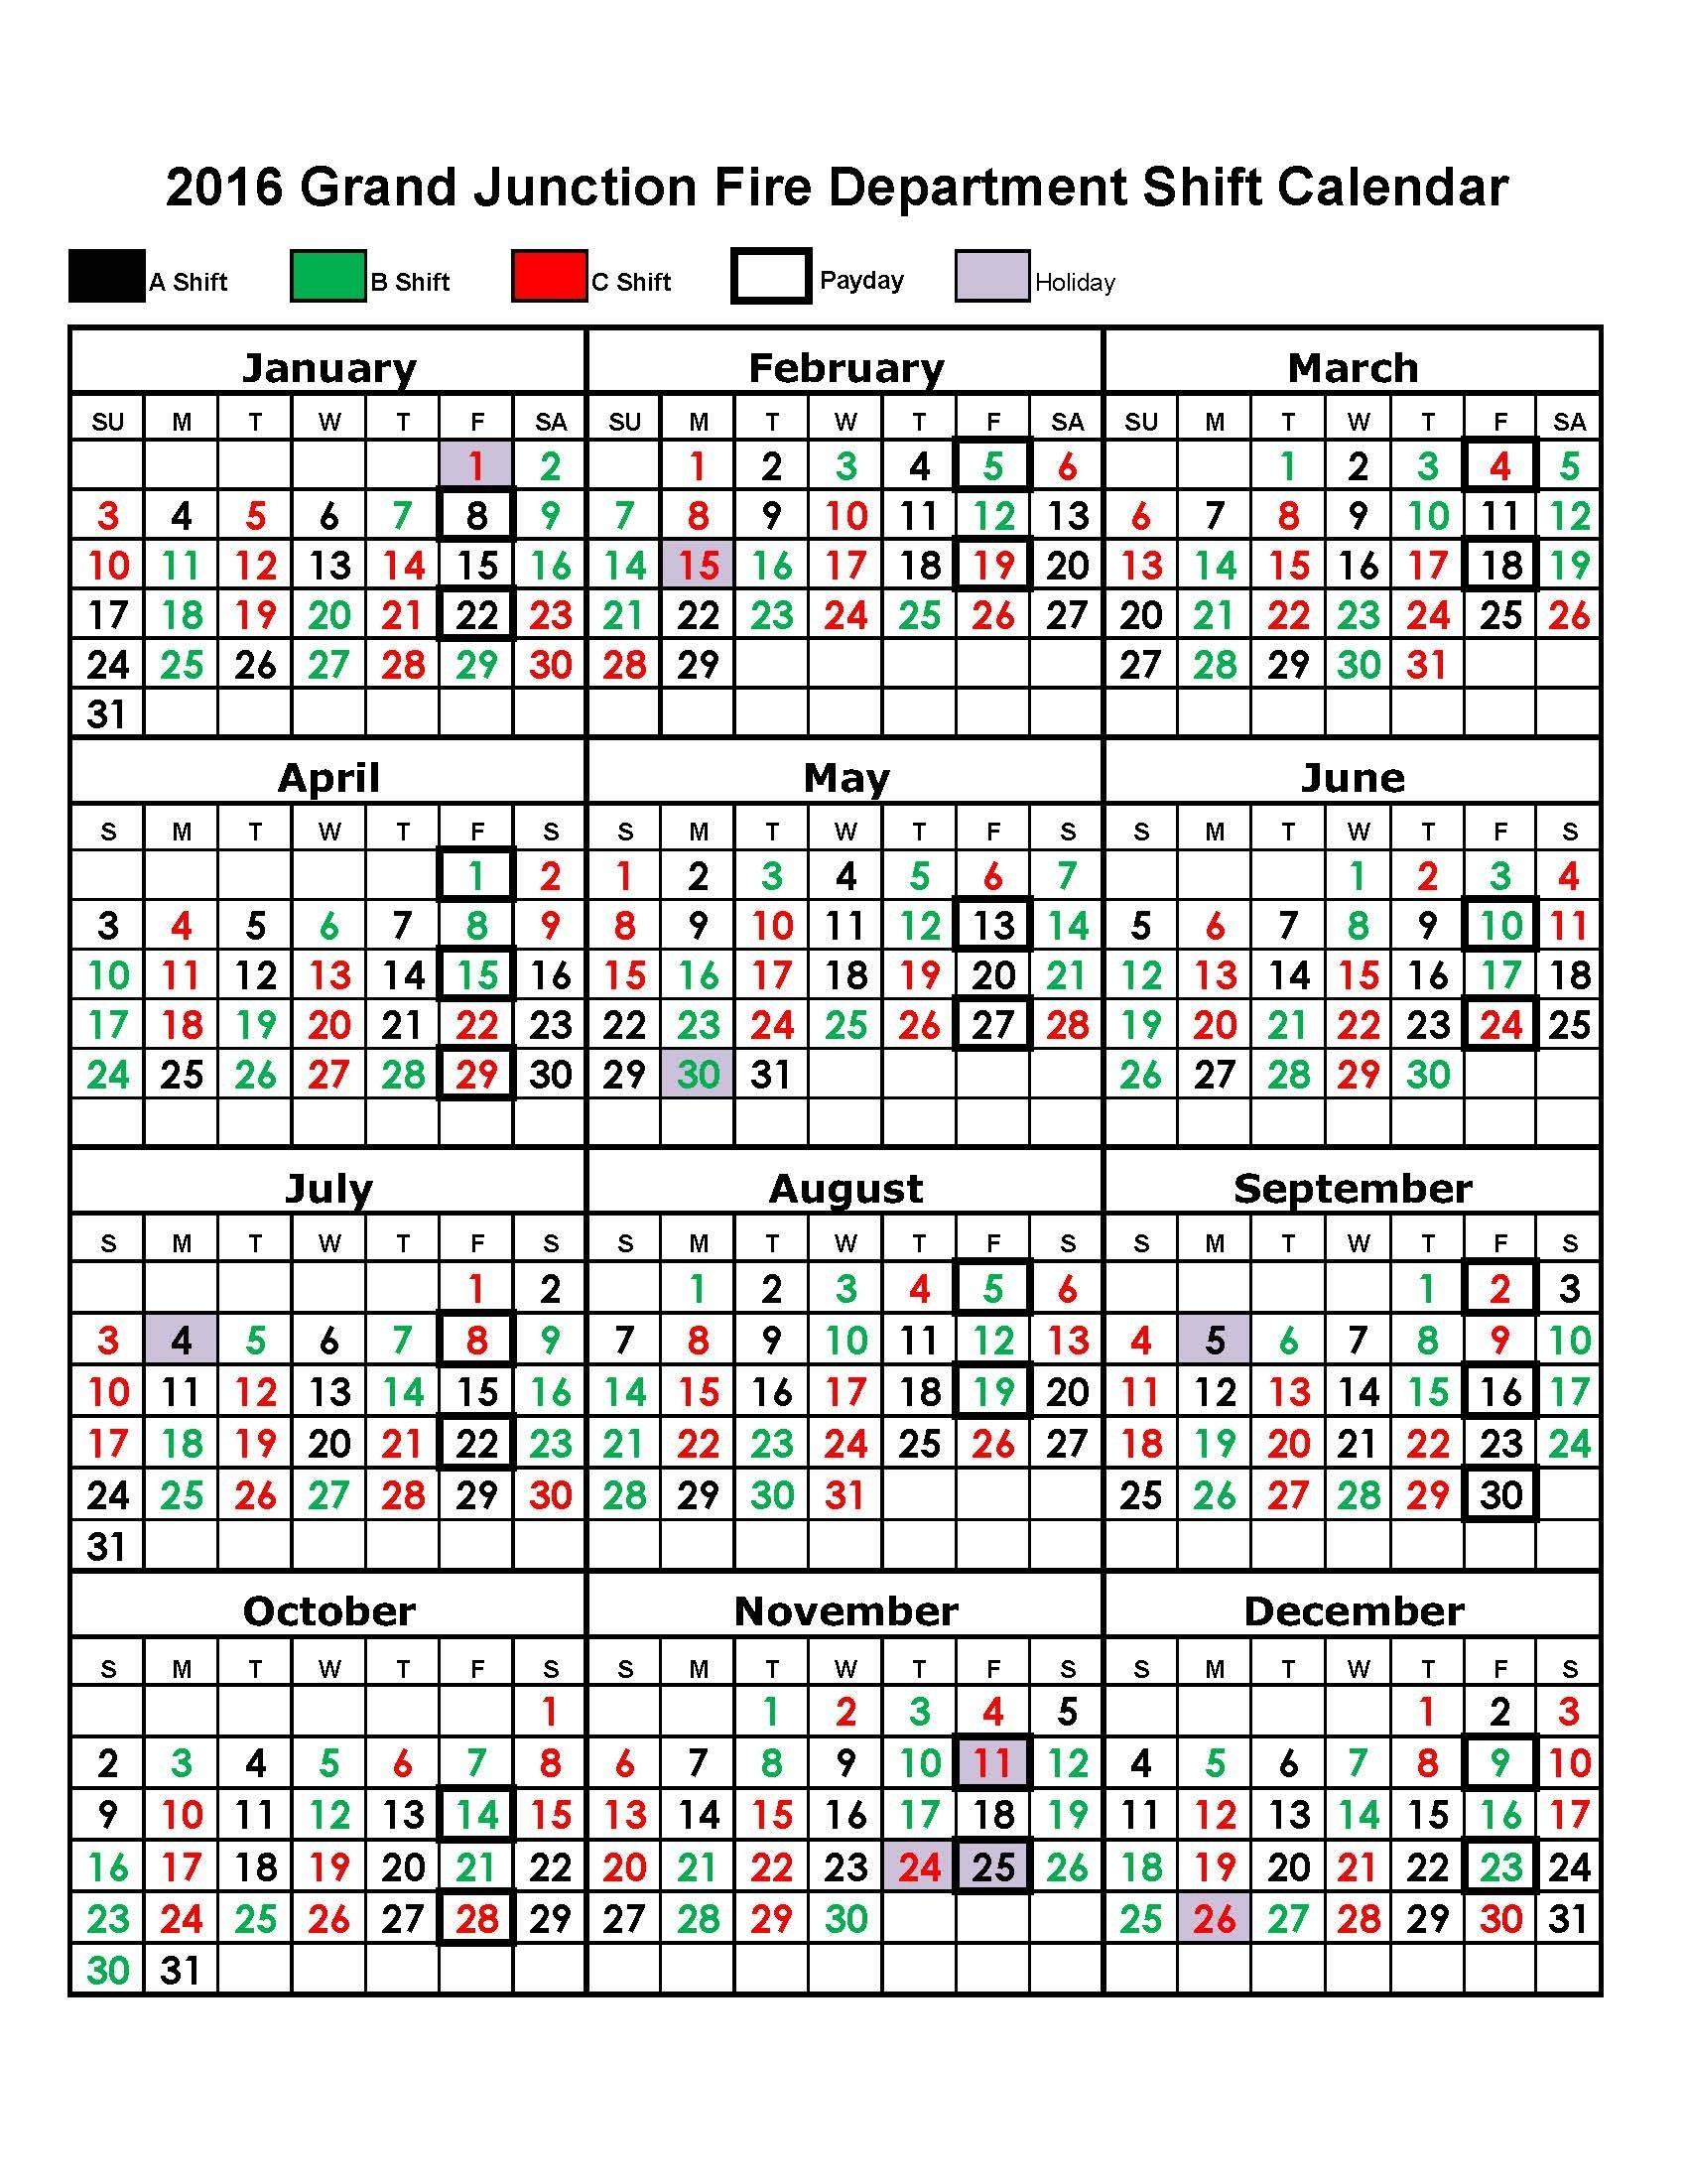 Houston Fire Department Shift Calendar | Printable Calendar 2020-2021-Calendar For Shift Work 2021